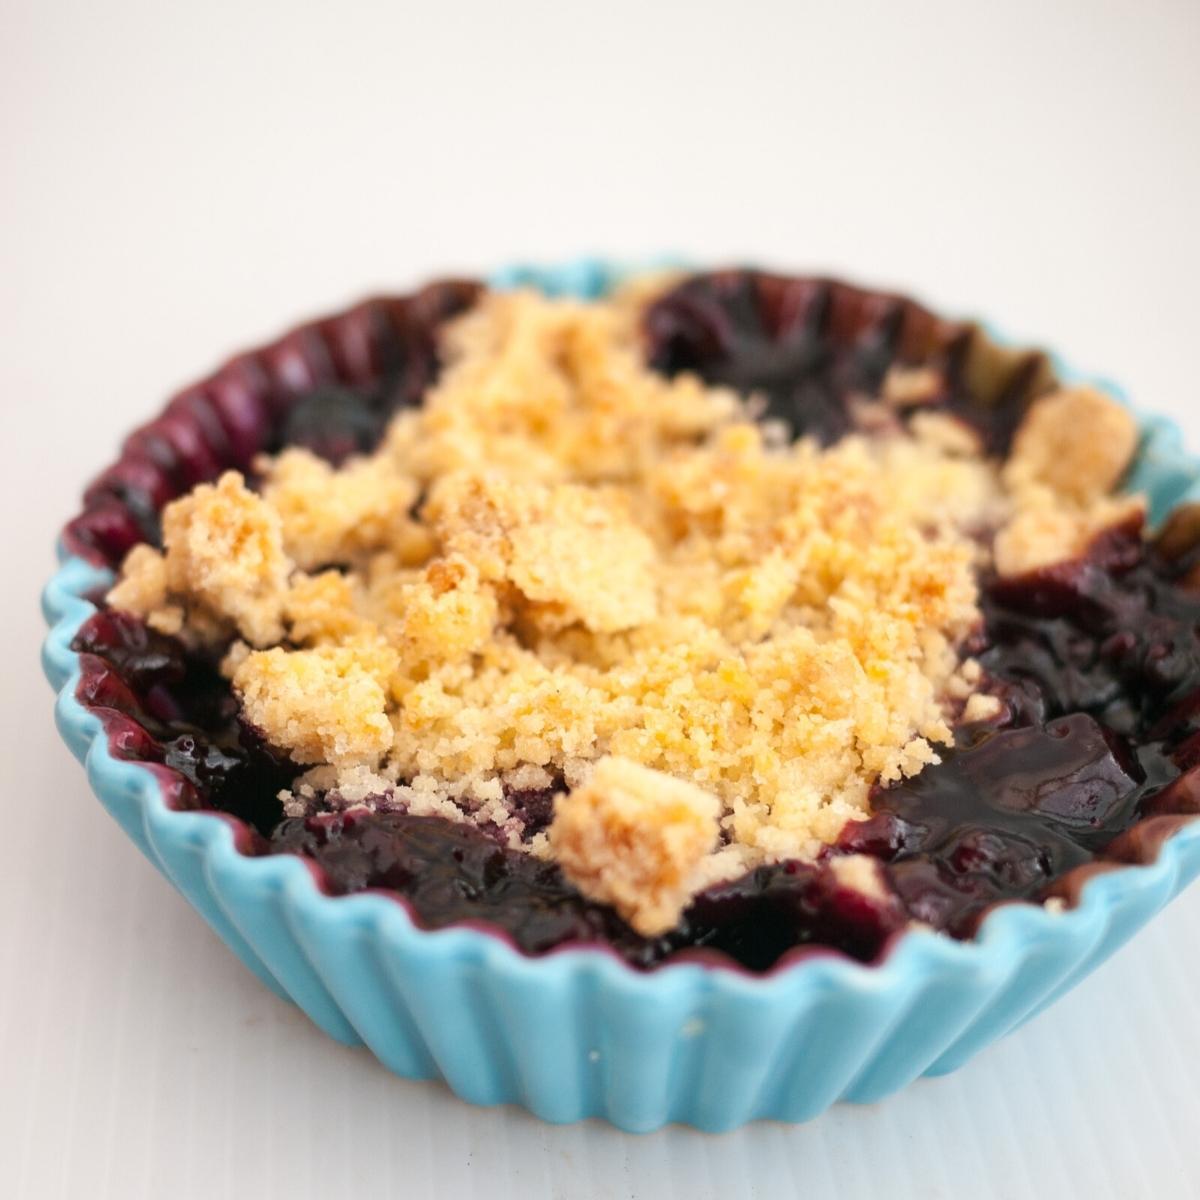 A ramekin with blueberry fruit crumble.